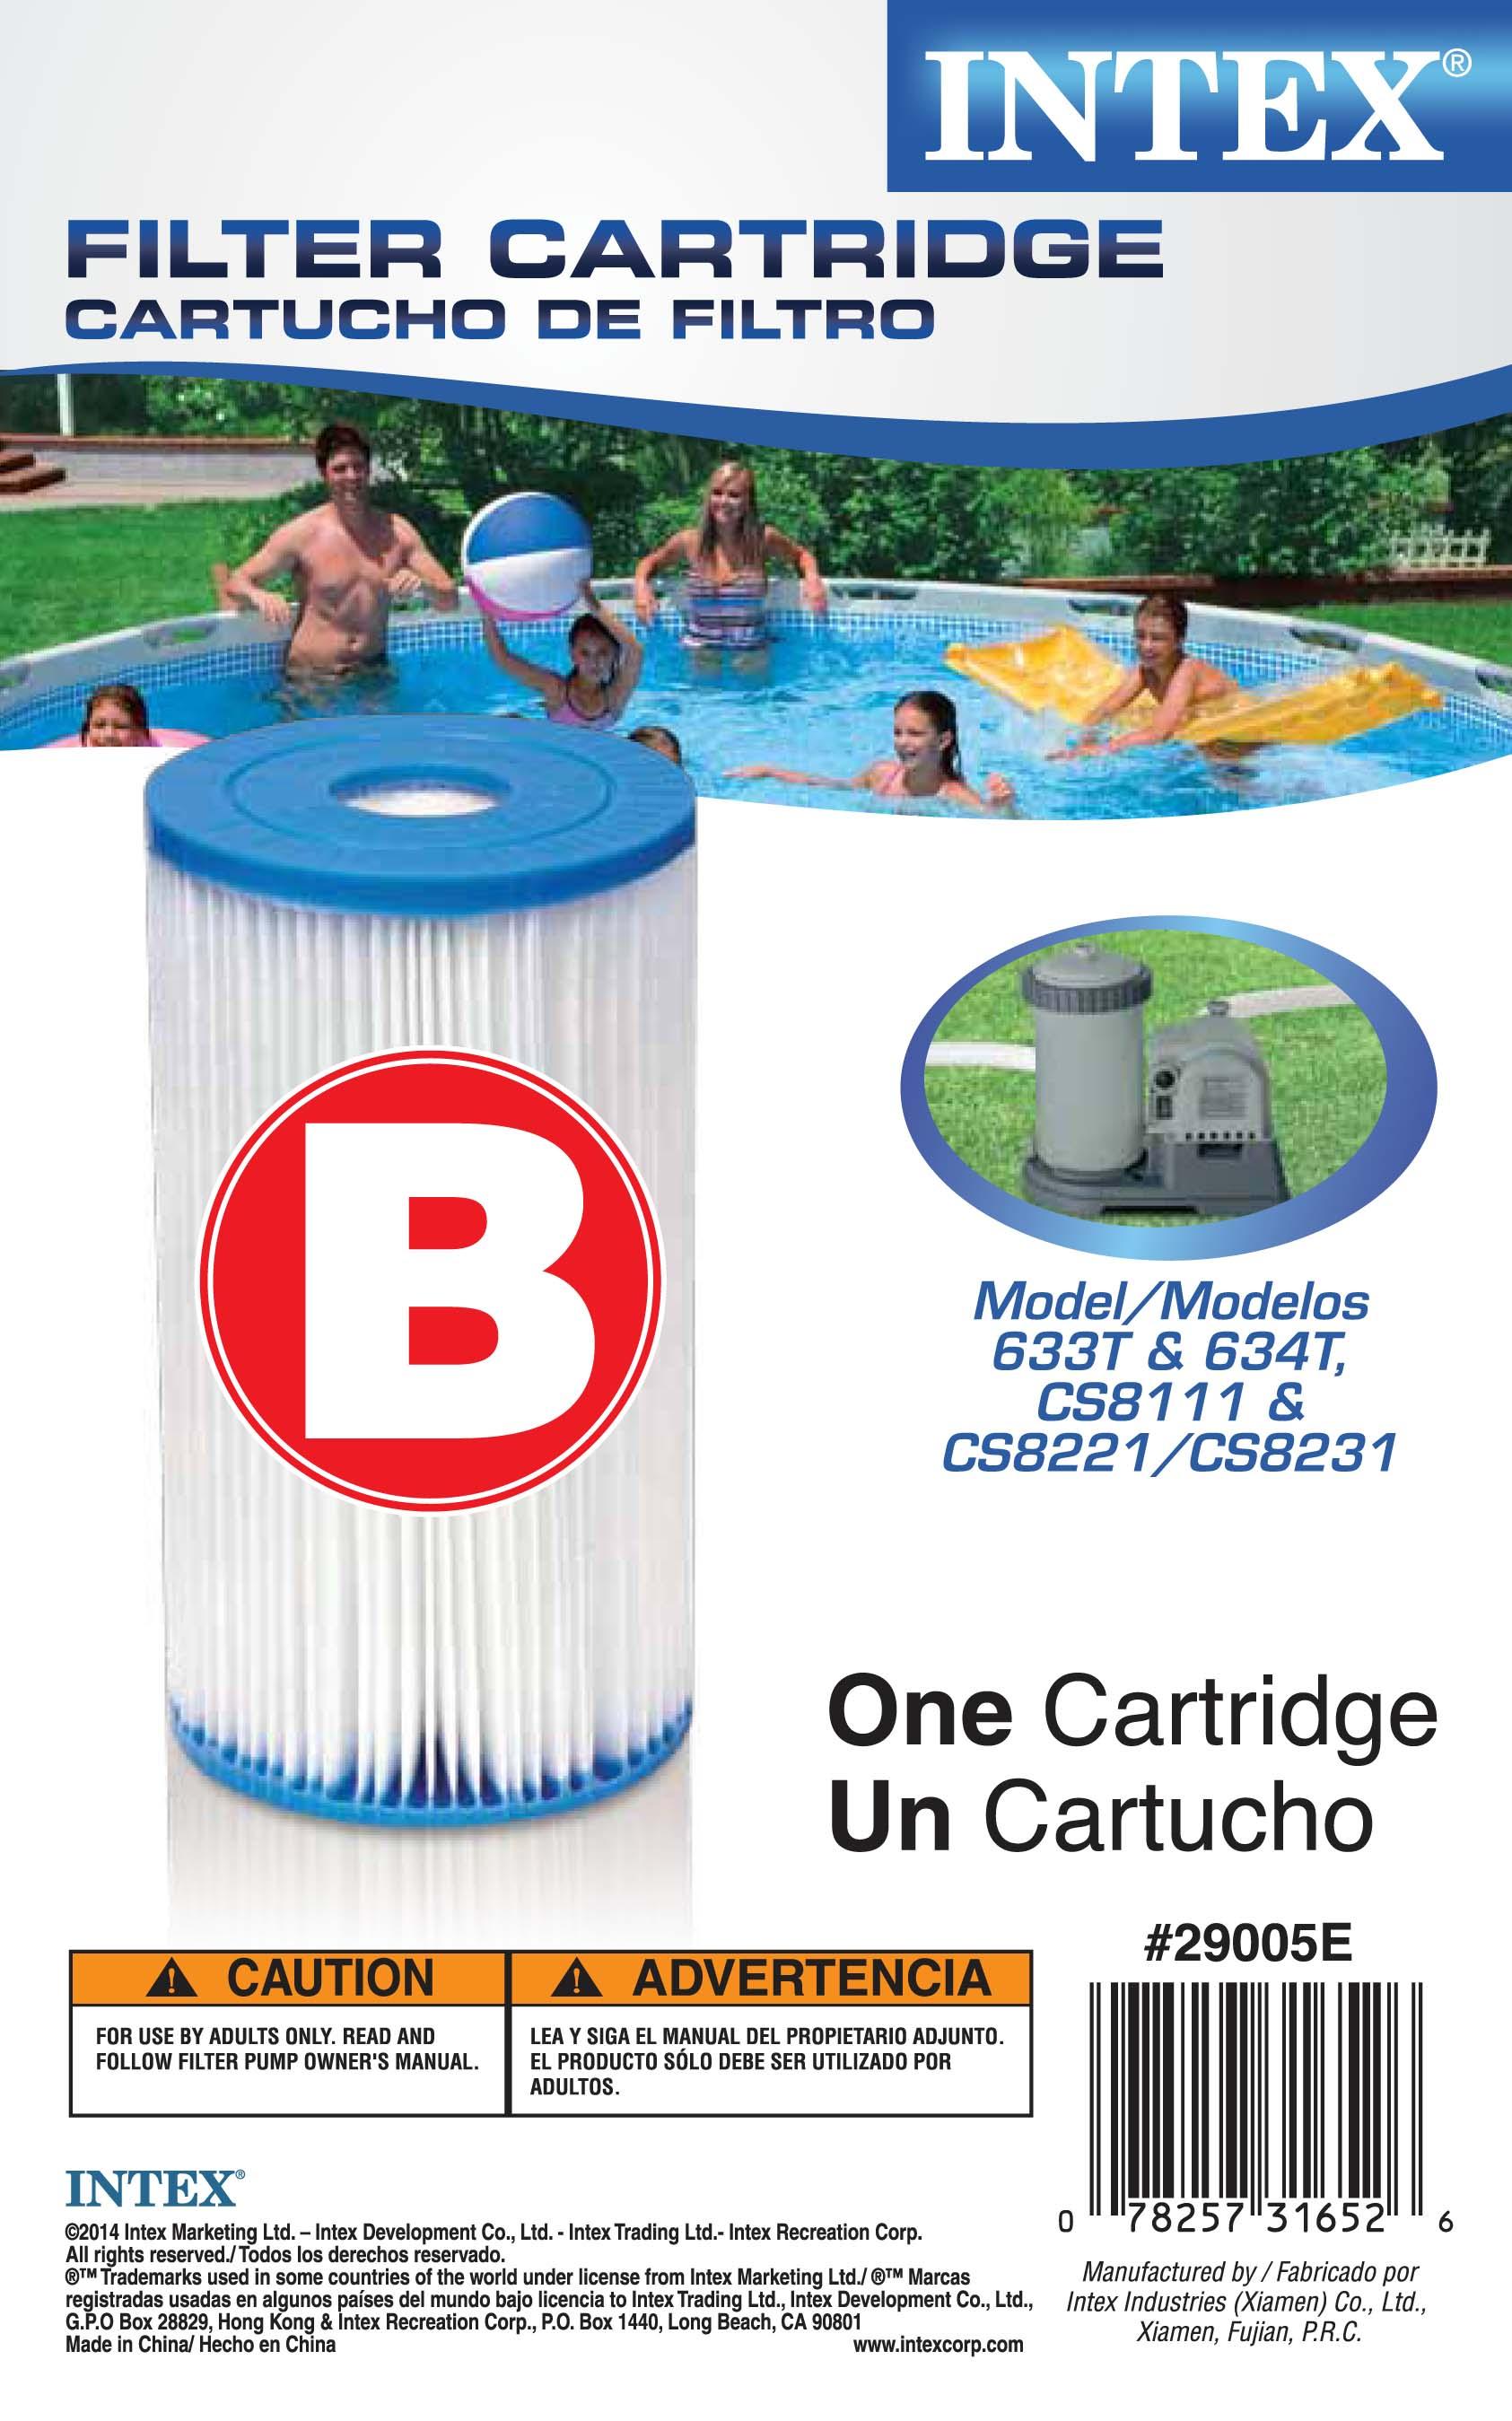 Intex Swimming Pool Type B Filter Cartridge 29005e Case Of